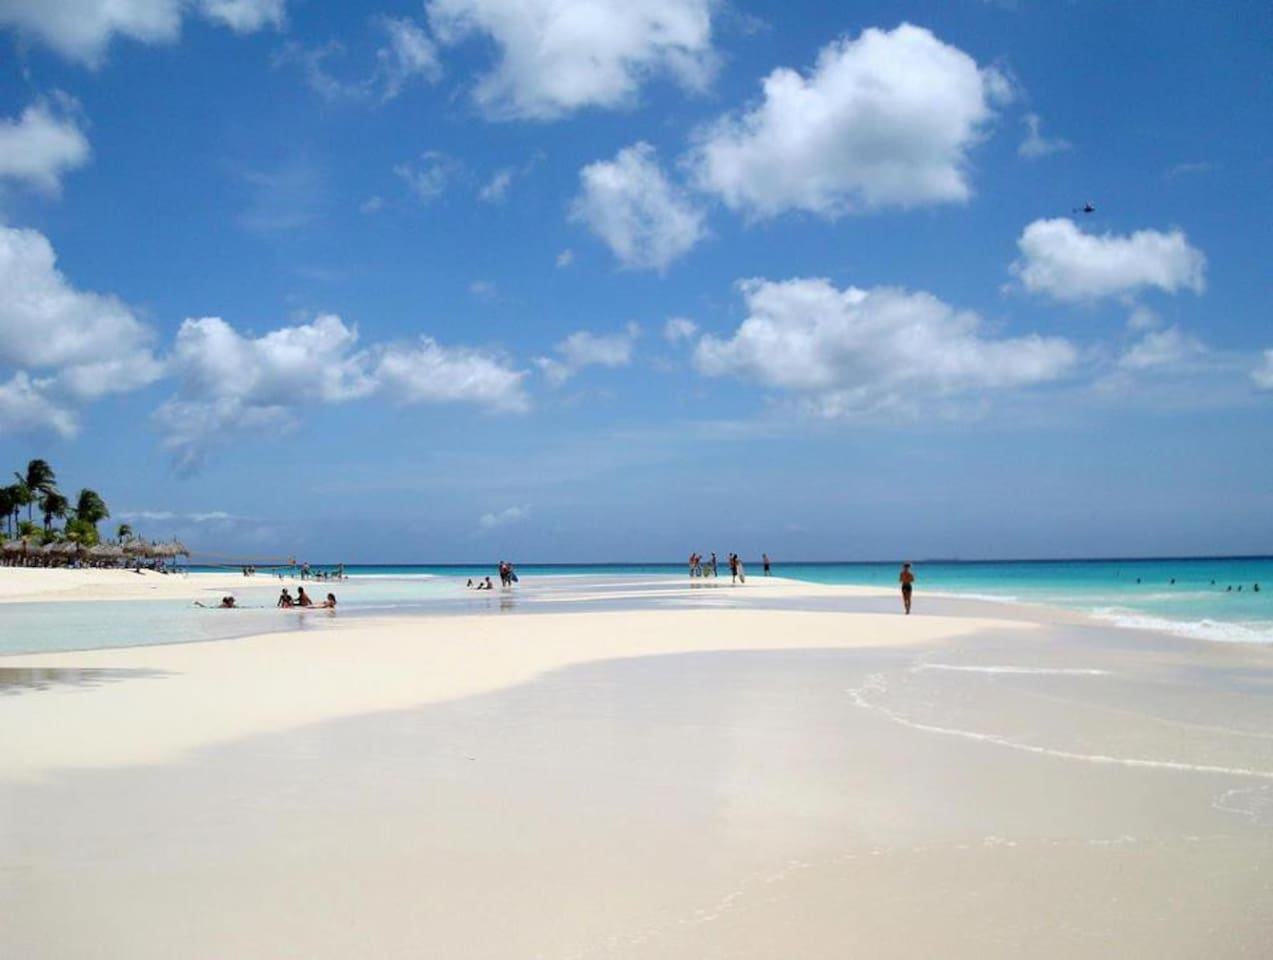 Eagle Beach!.. Rated as the BEST beach in the caribbean by TripAdvisor & USA Today :)